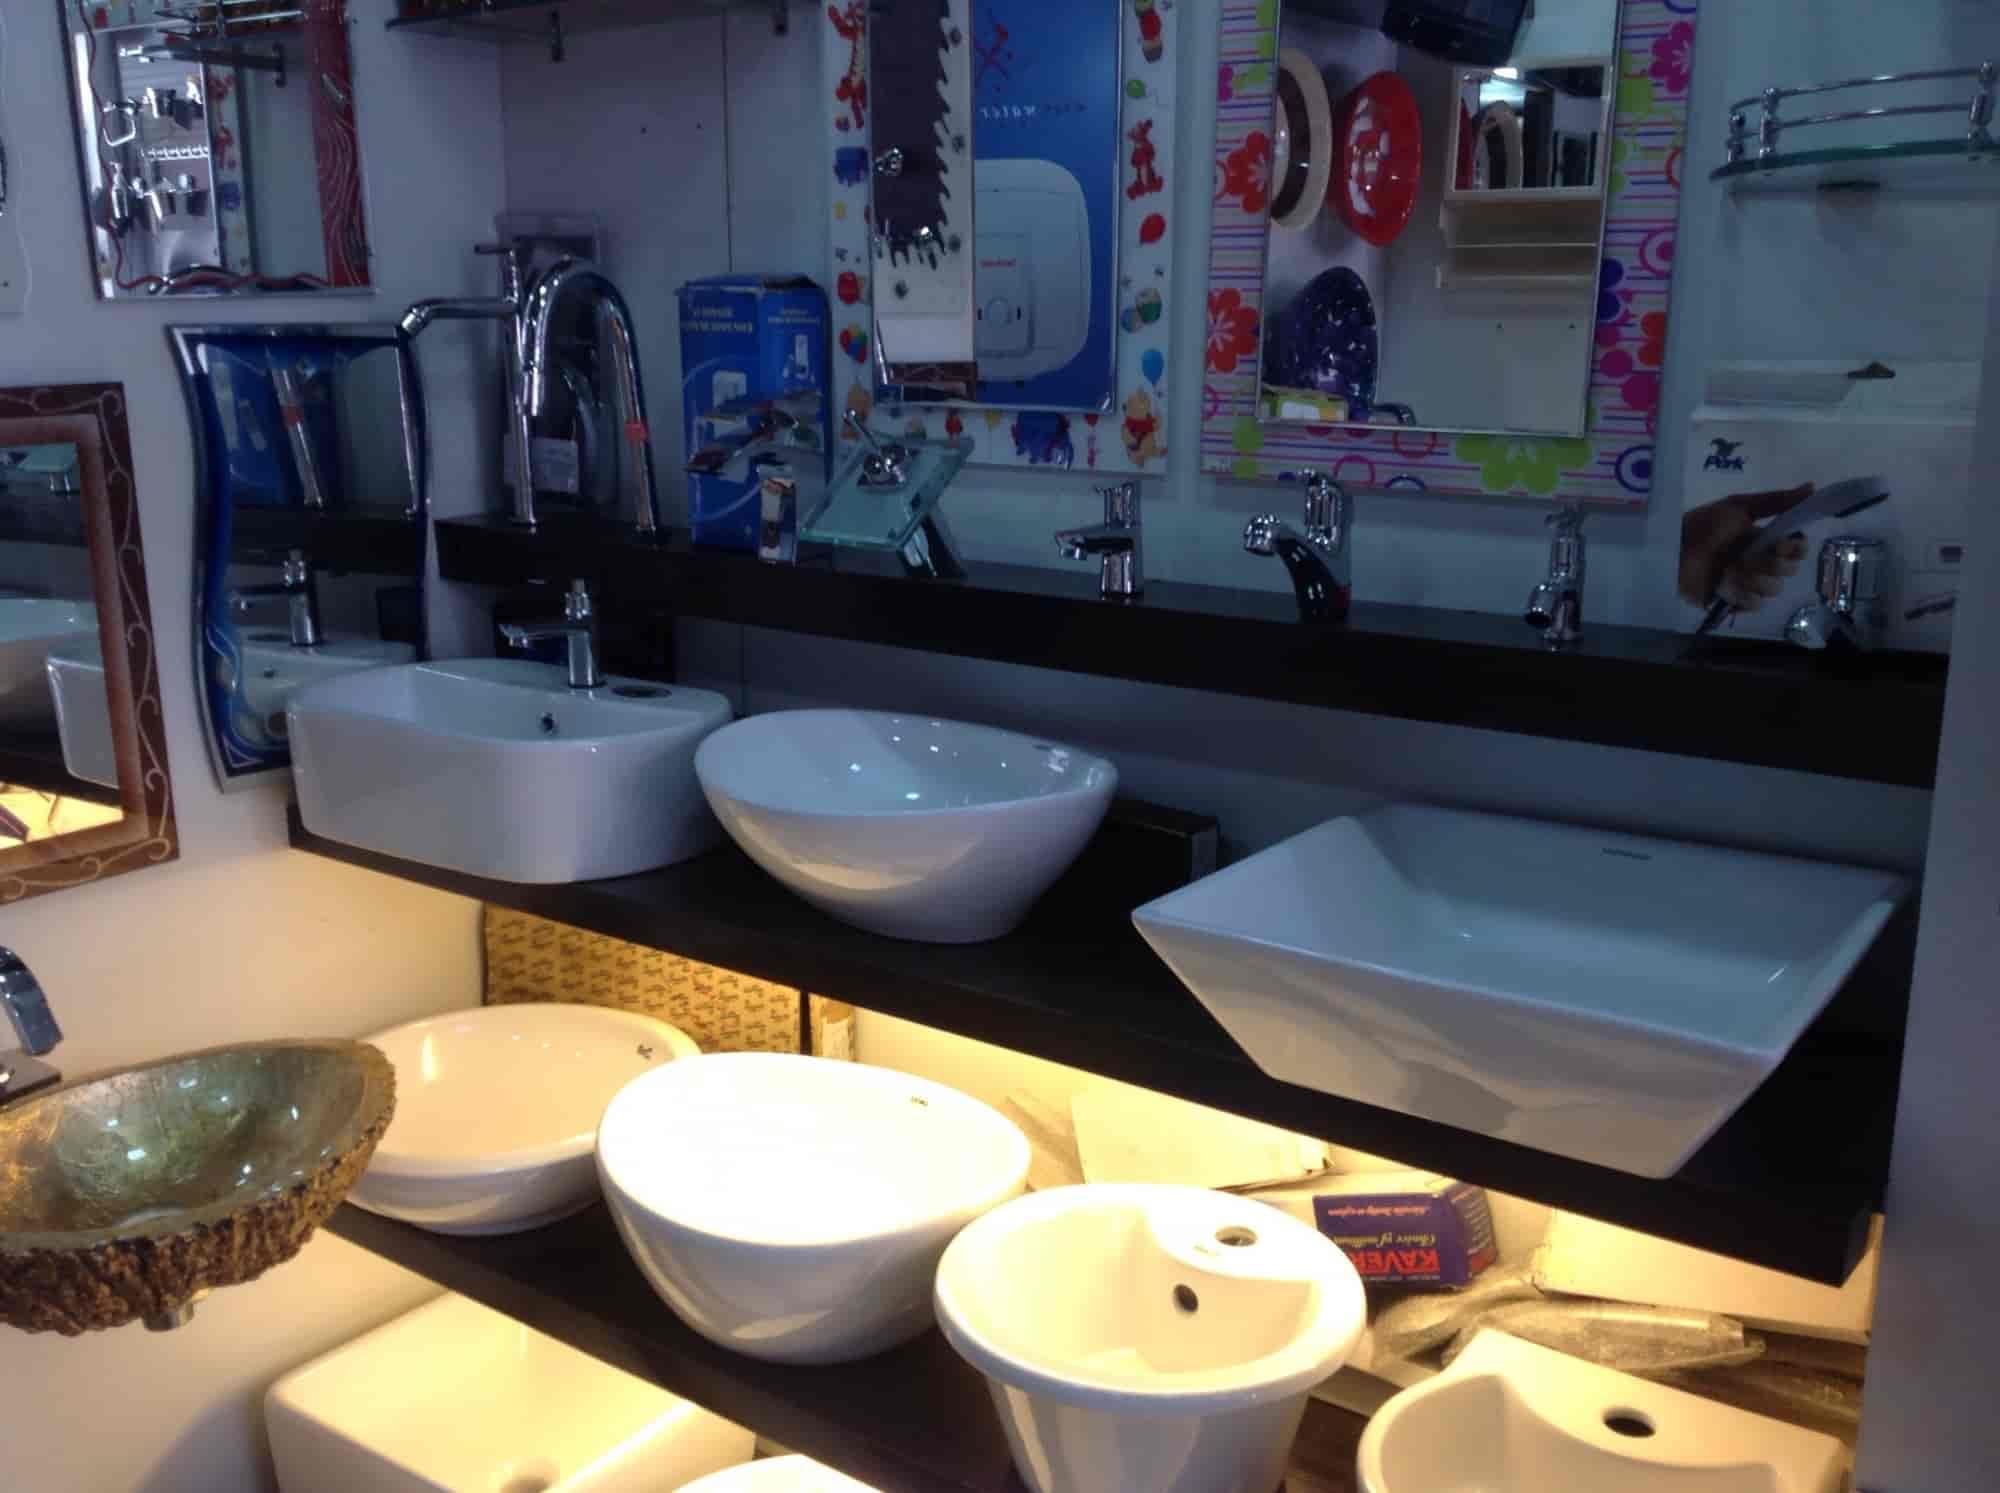 Monark Designer Bath Photos, Airoli, Navi-Mumbai- Pictures & Images ...